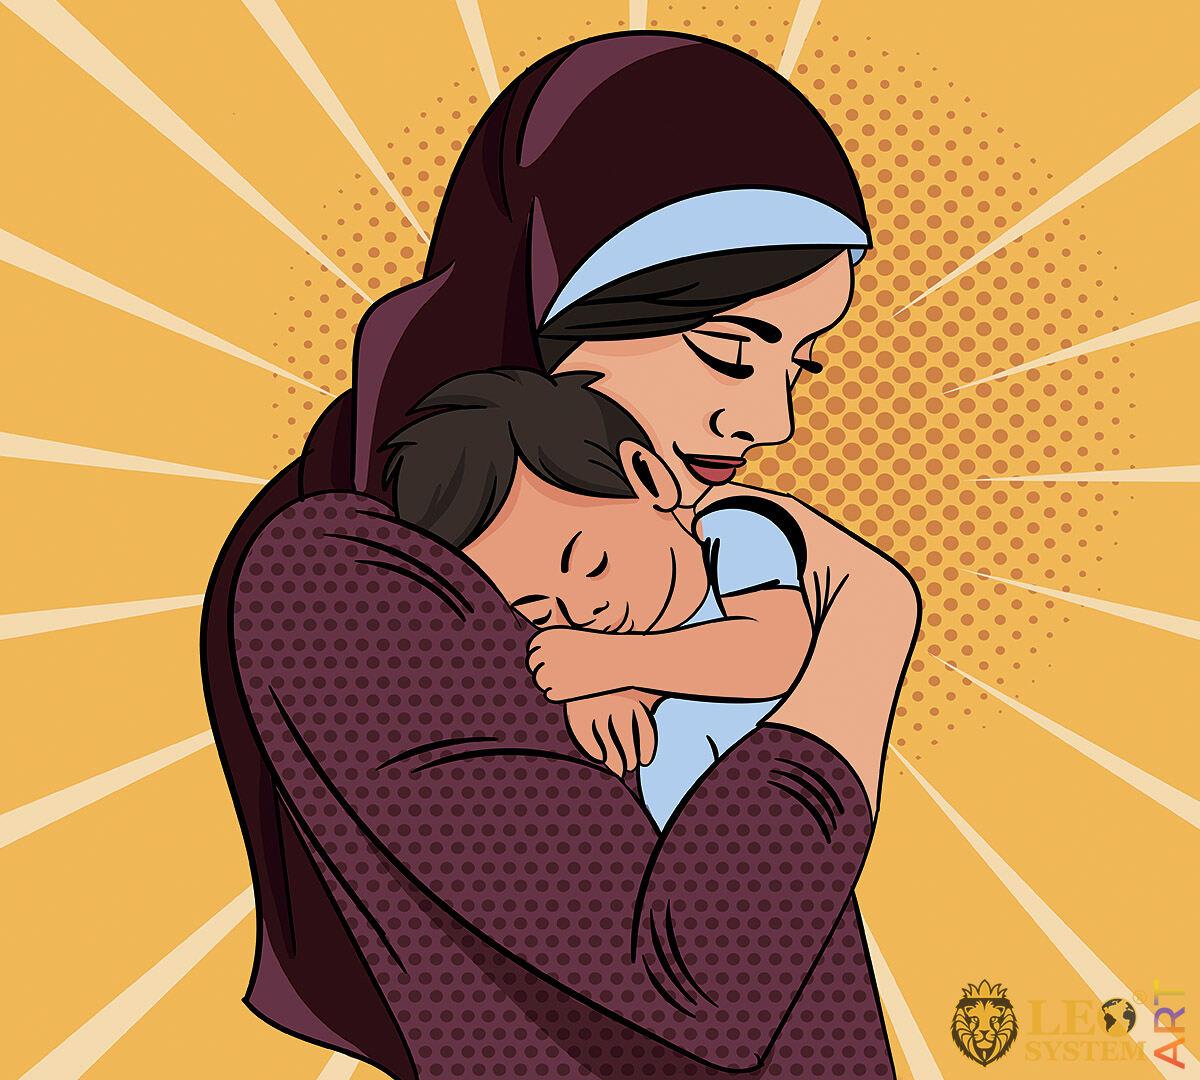 Mom gently hugs her beloved baby